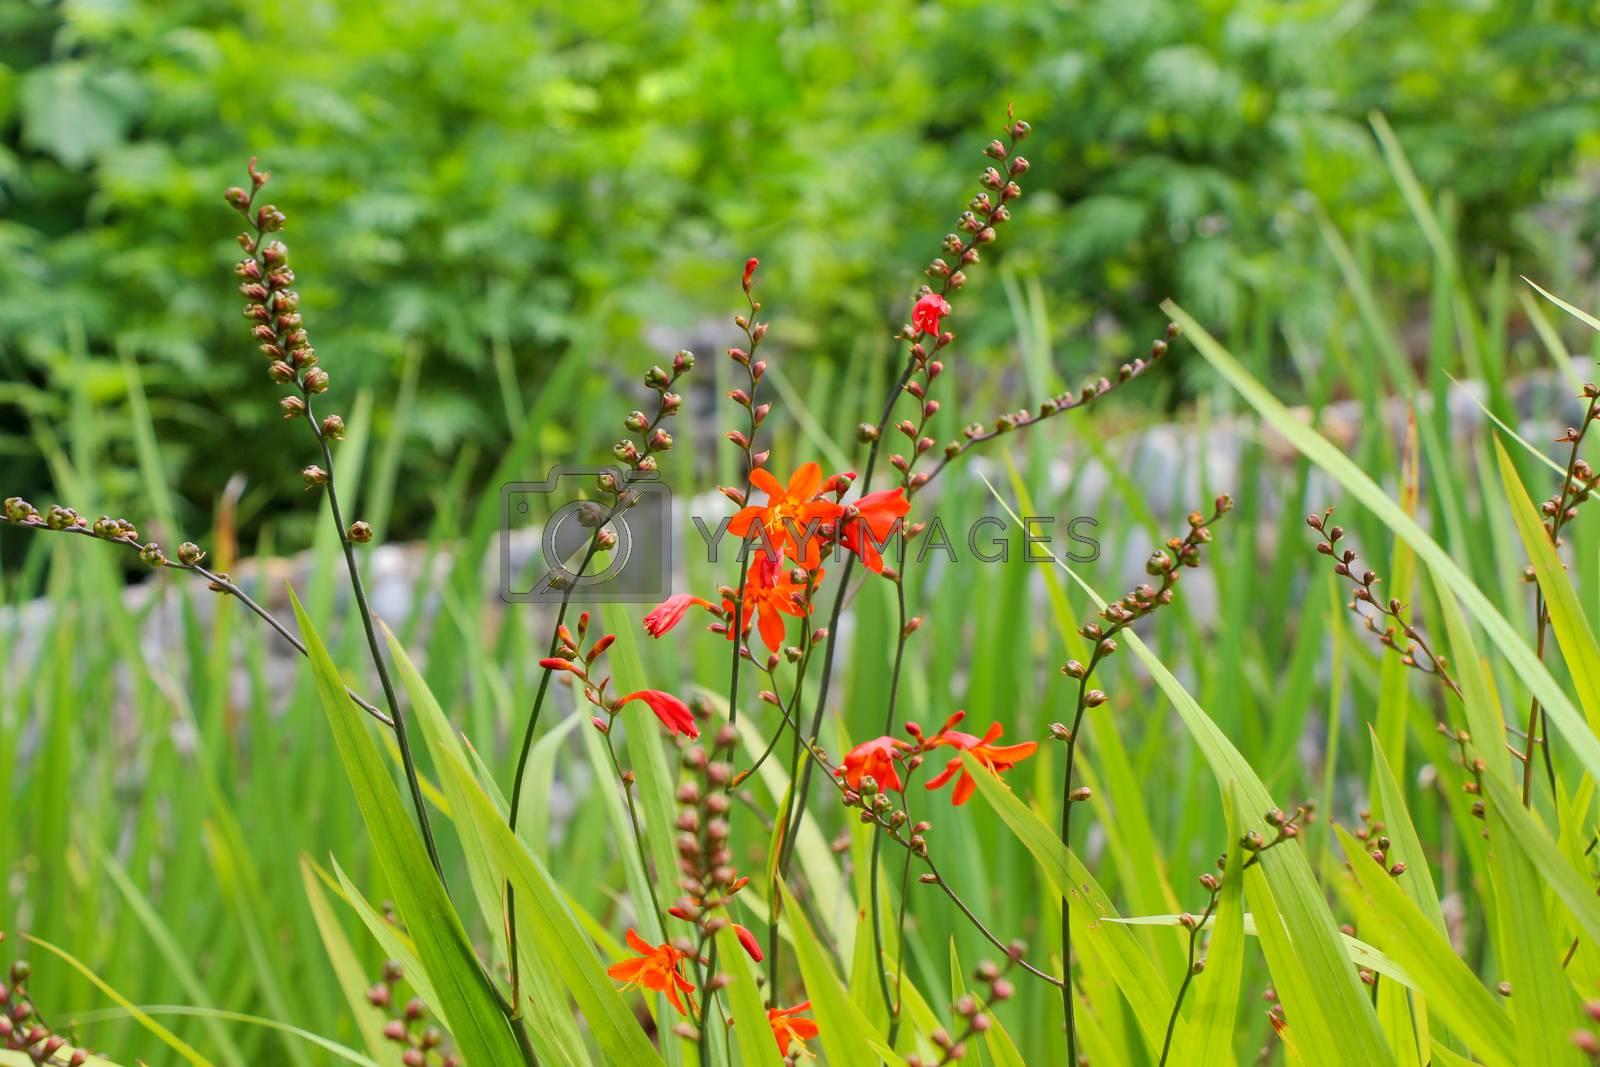 Beautiful Crocosmia flowers in nature by berkay